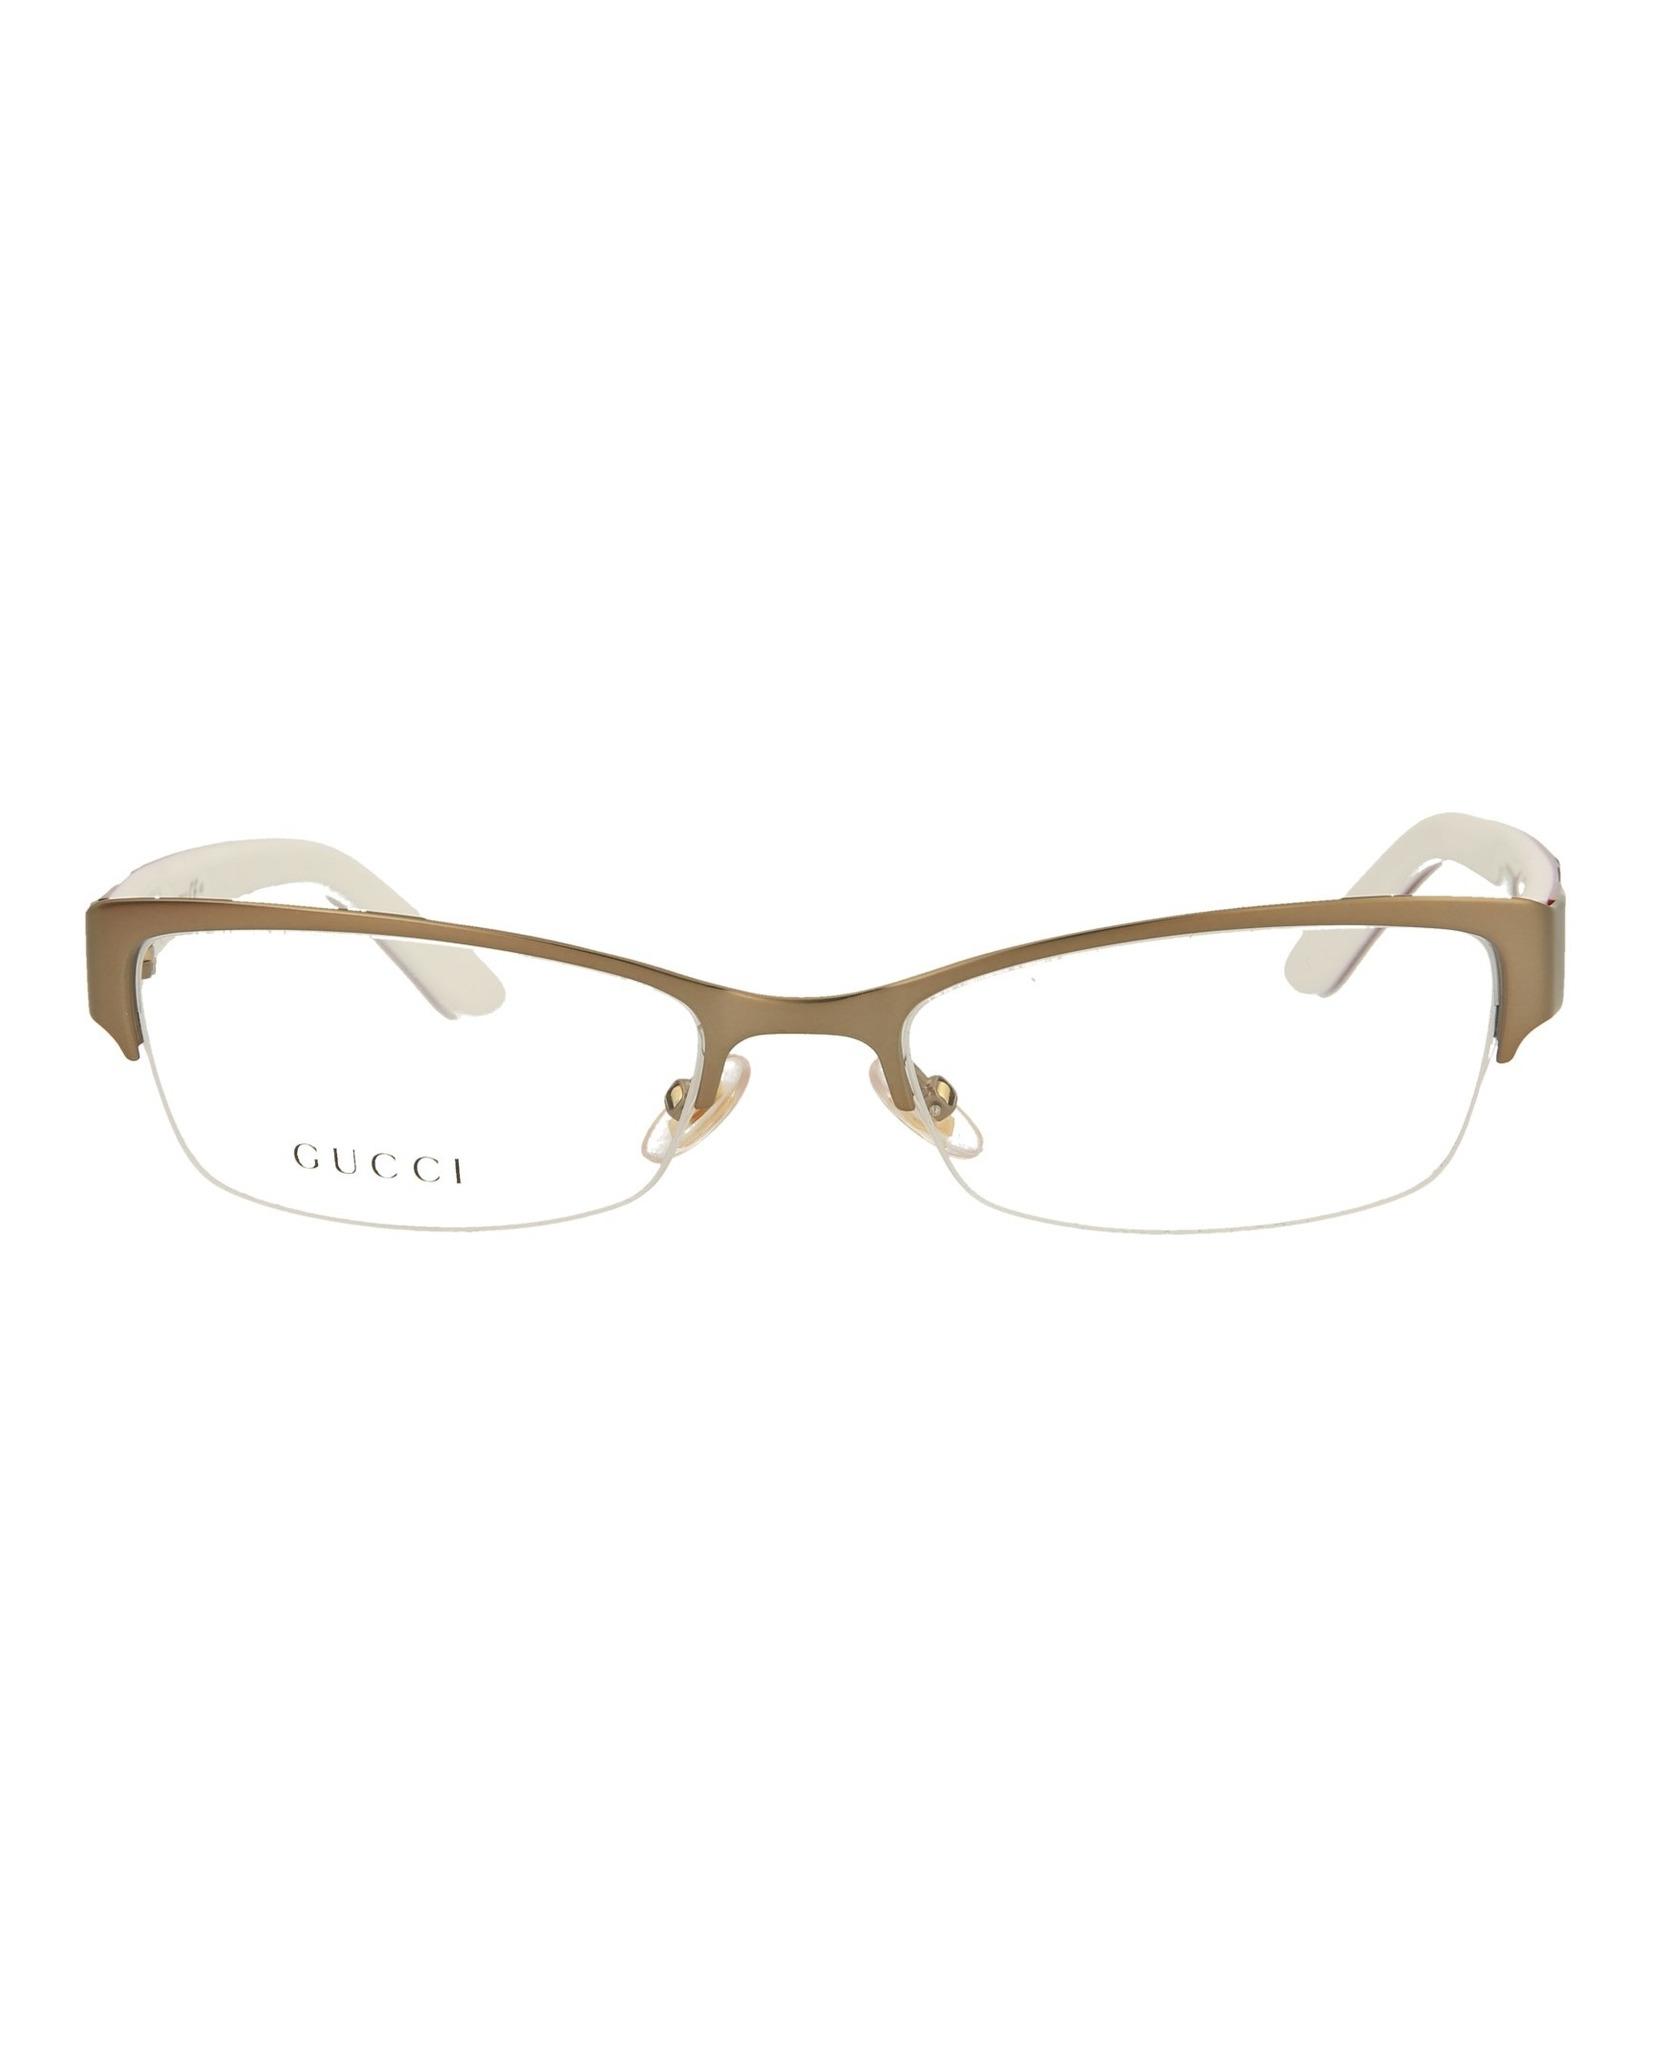 e9d799e73b Gucci Womens Square Rectangle Optical Frames GG4213-1571075L3-5317 ...